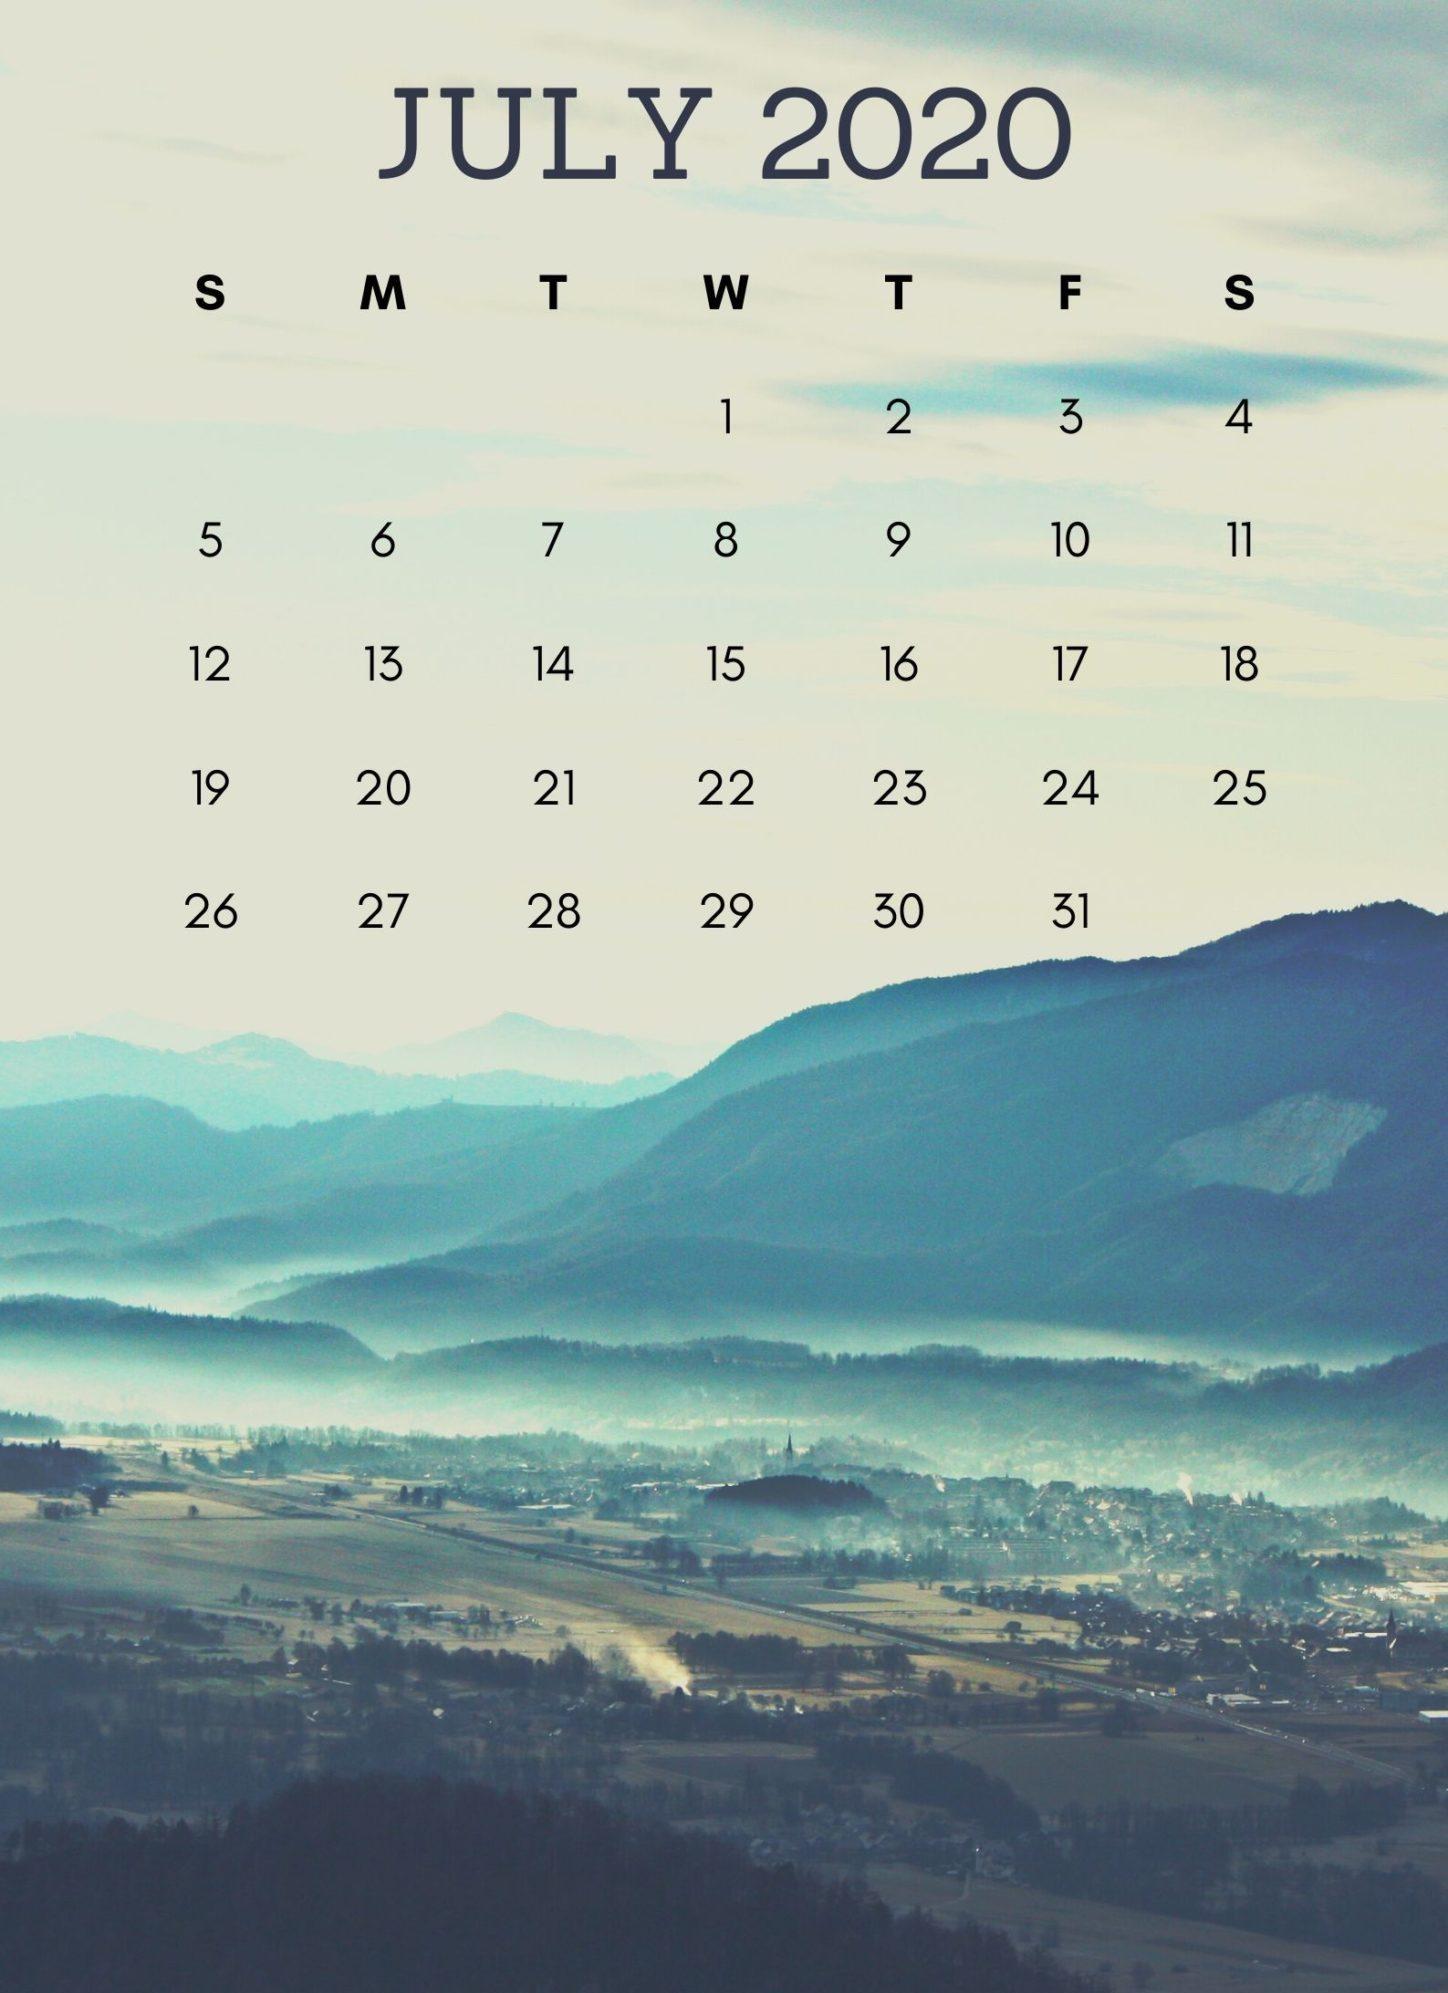 iPhone July 2020 Nature Calendar Wallpaper